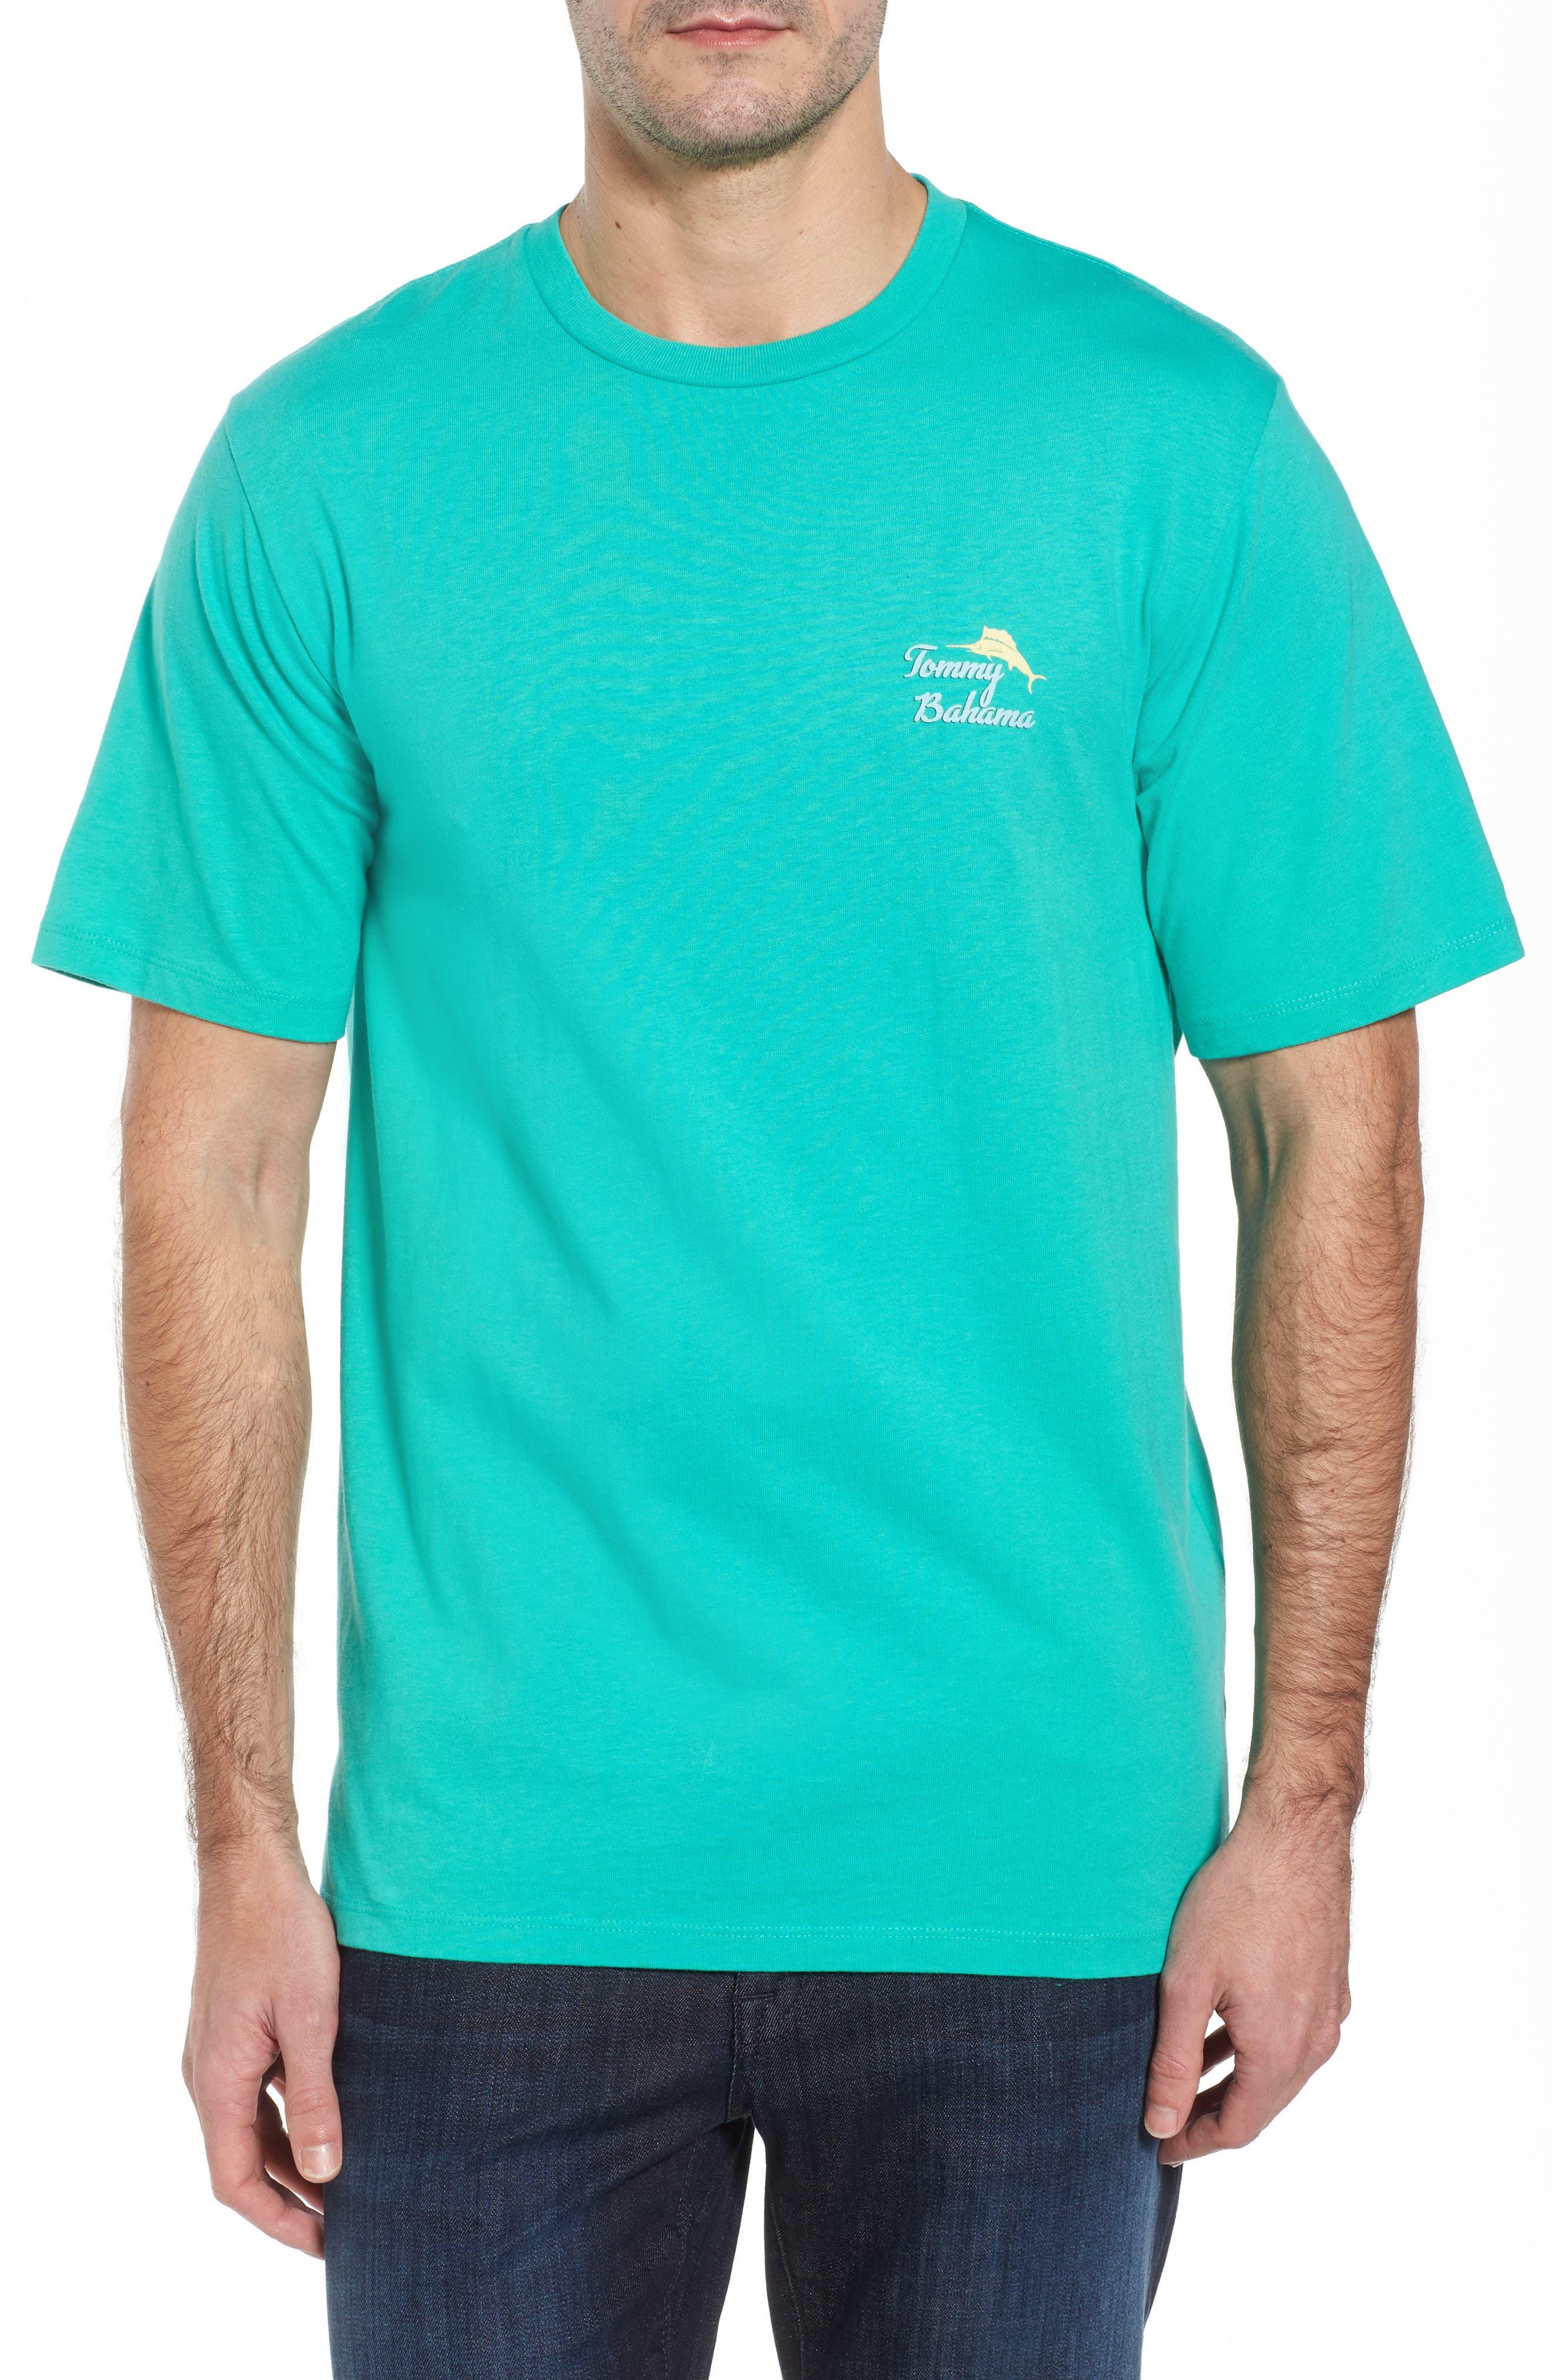 First Class Seat T-Shirt,                             Main thumbnail 1, color,                             300